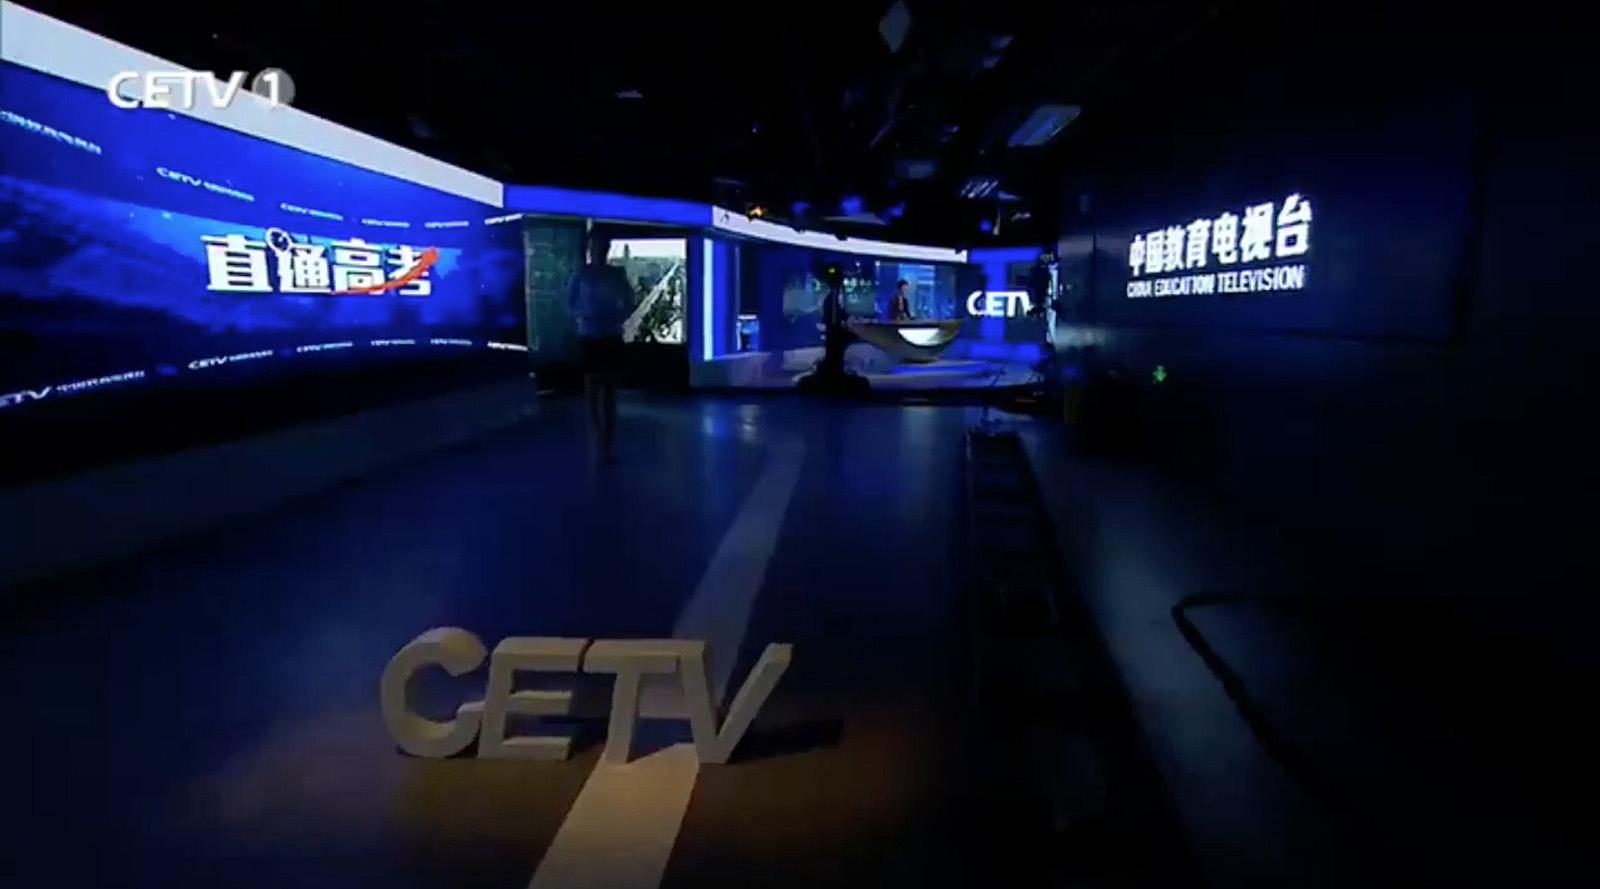 ncs_China-Education-Network-Television-Studio_0005